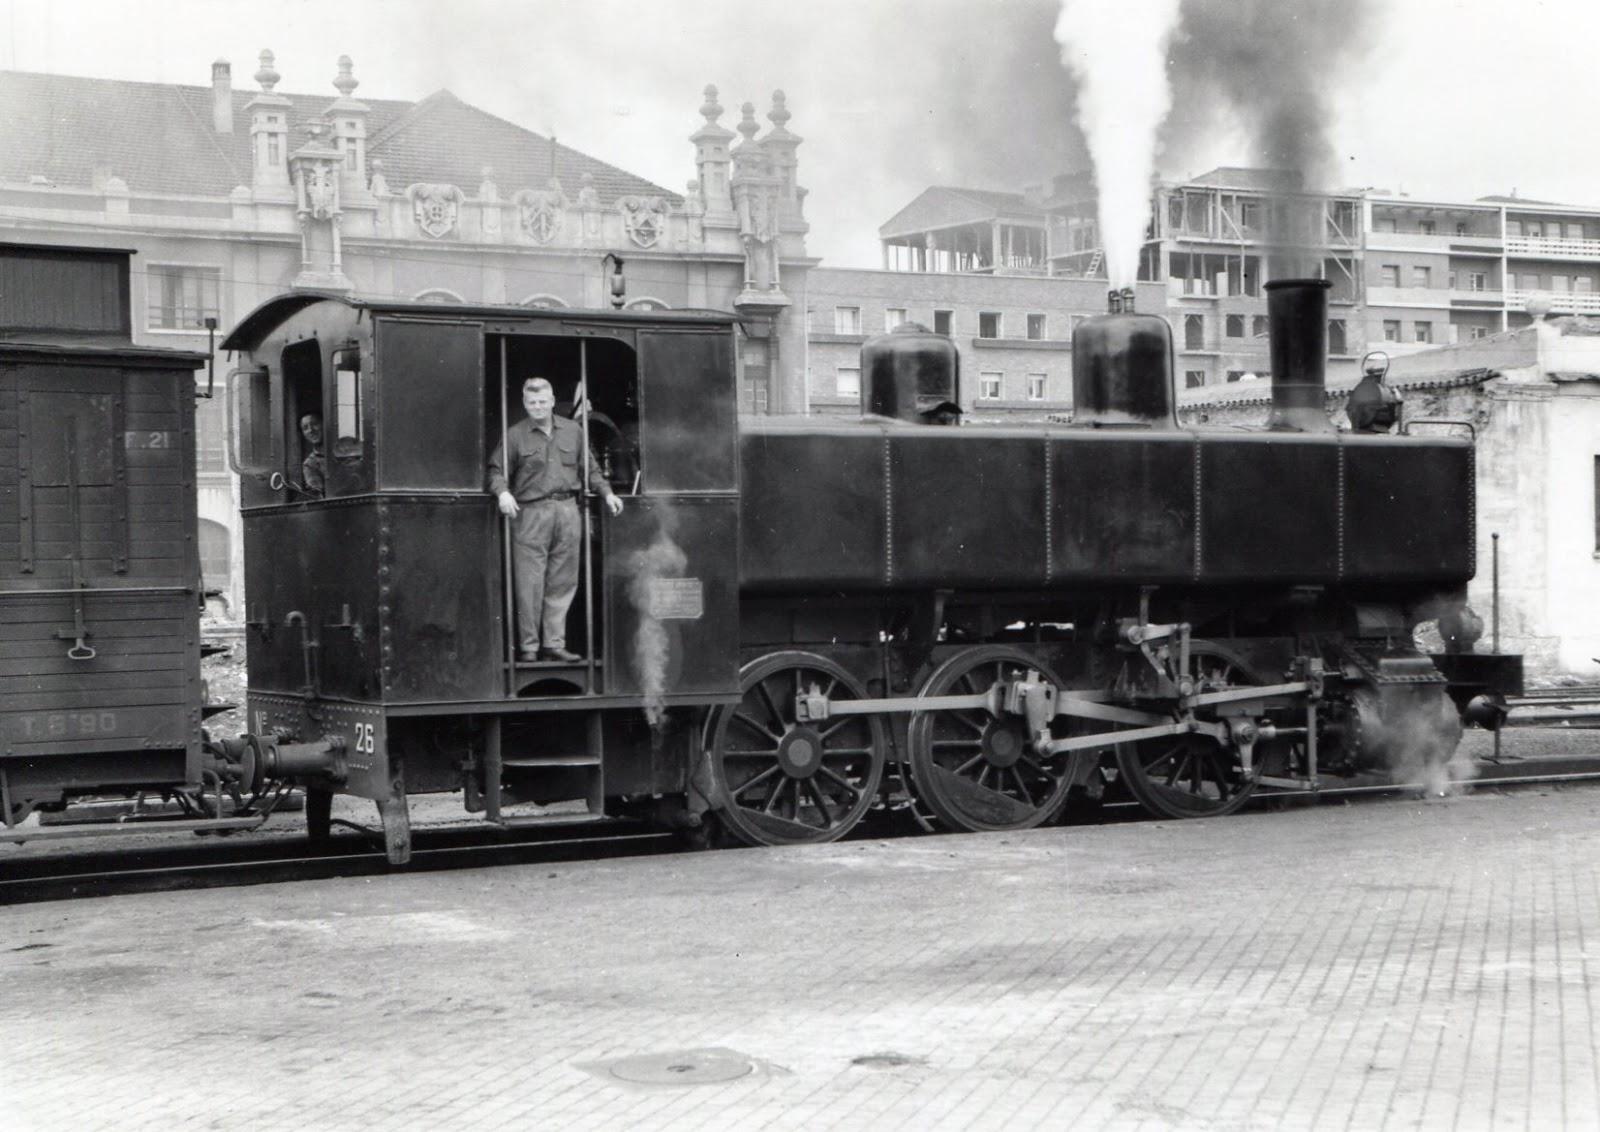 Ferrocarril de Langreo Locomotora nº 26 , foto Lawrence G. Marshall, fondo MVF